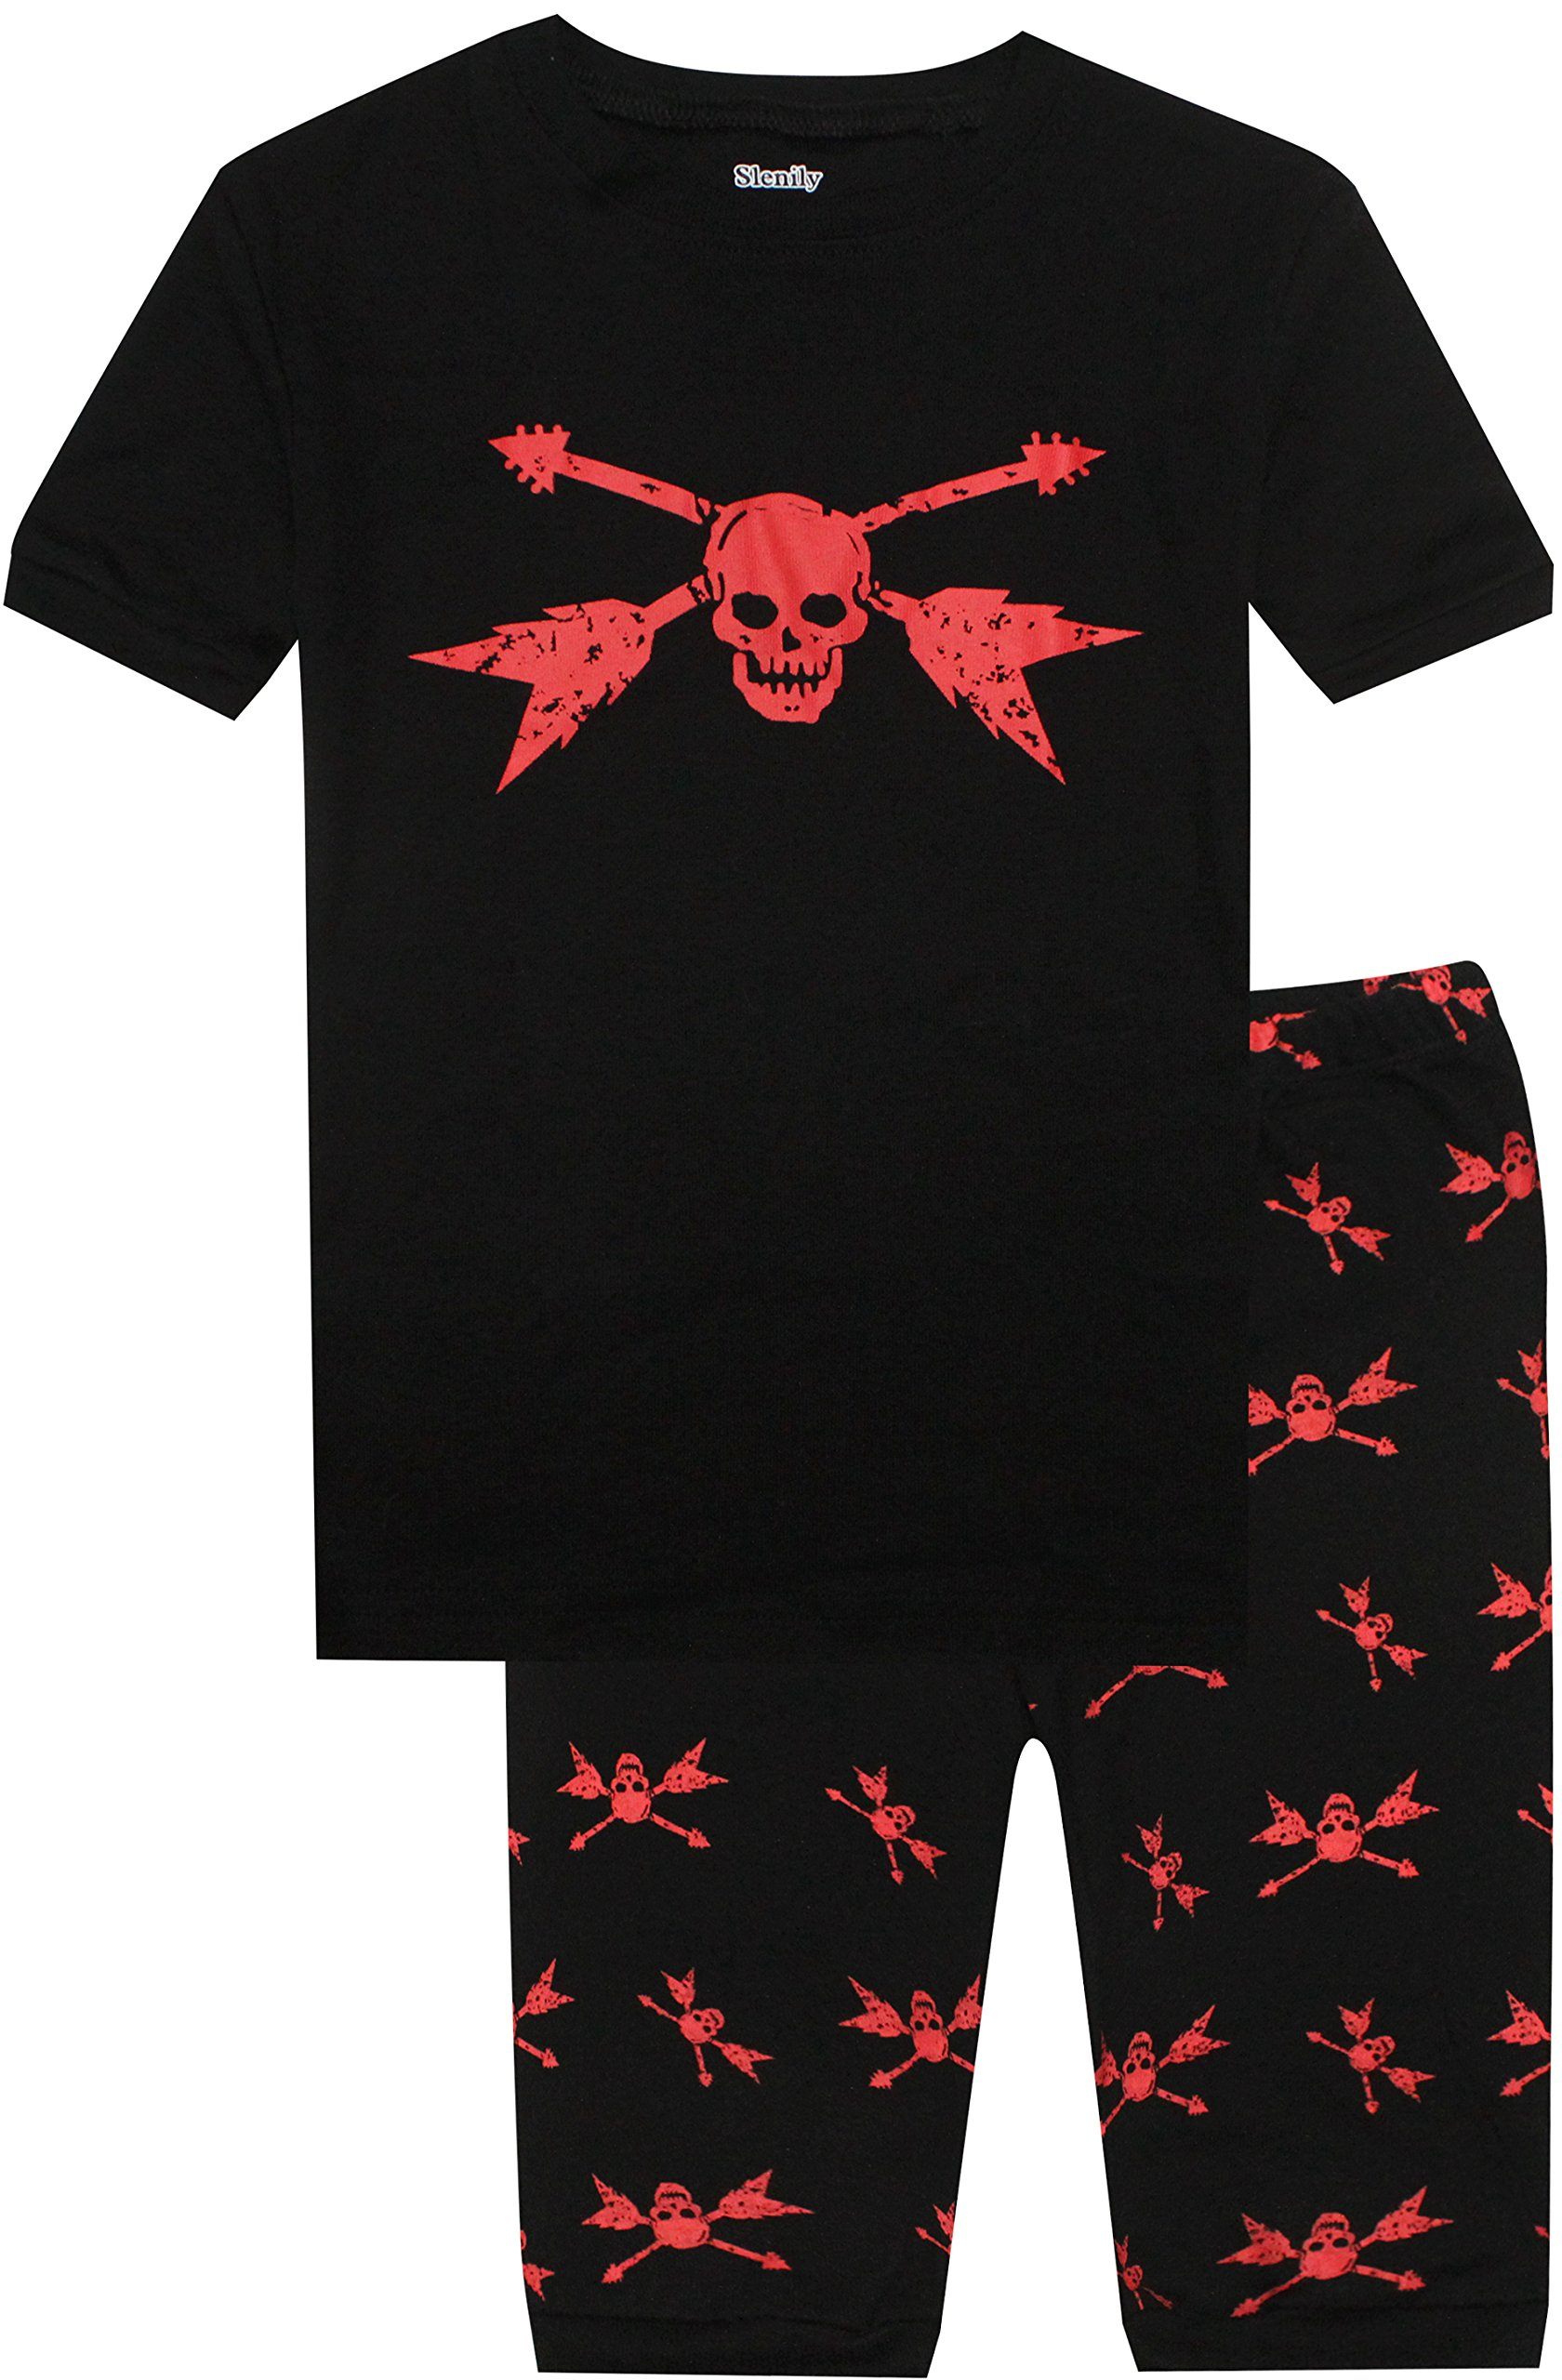 Slenily Boys Shorts 2 Piece Pajamas Set Skeleton Black 100% Cotton Toddler Kids Sleepwear Size 7